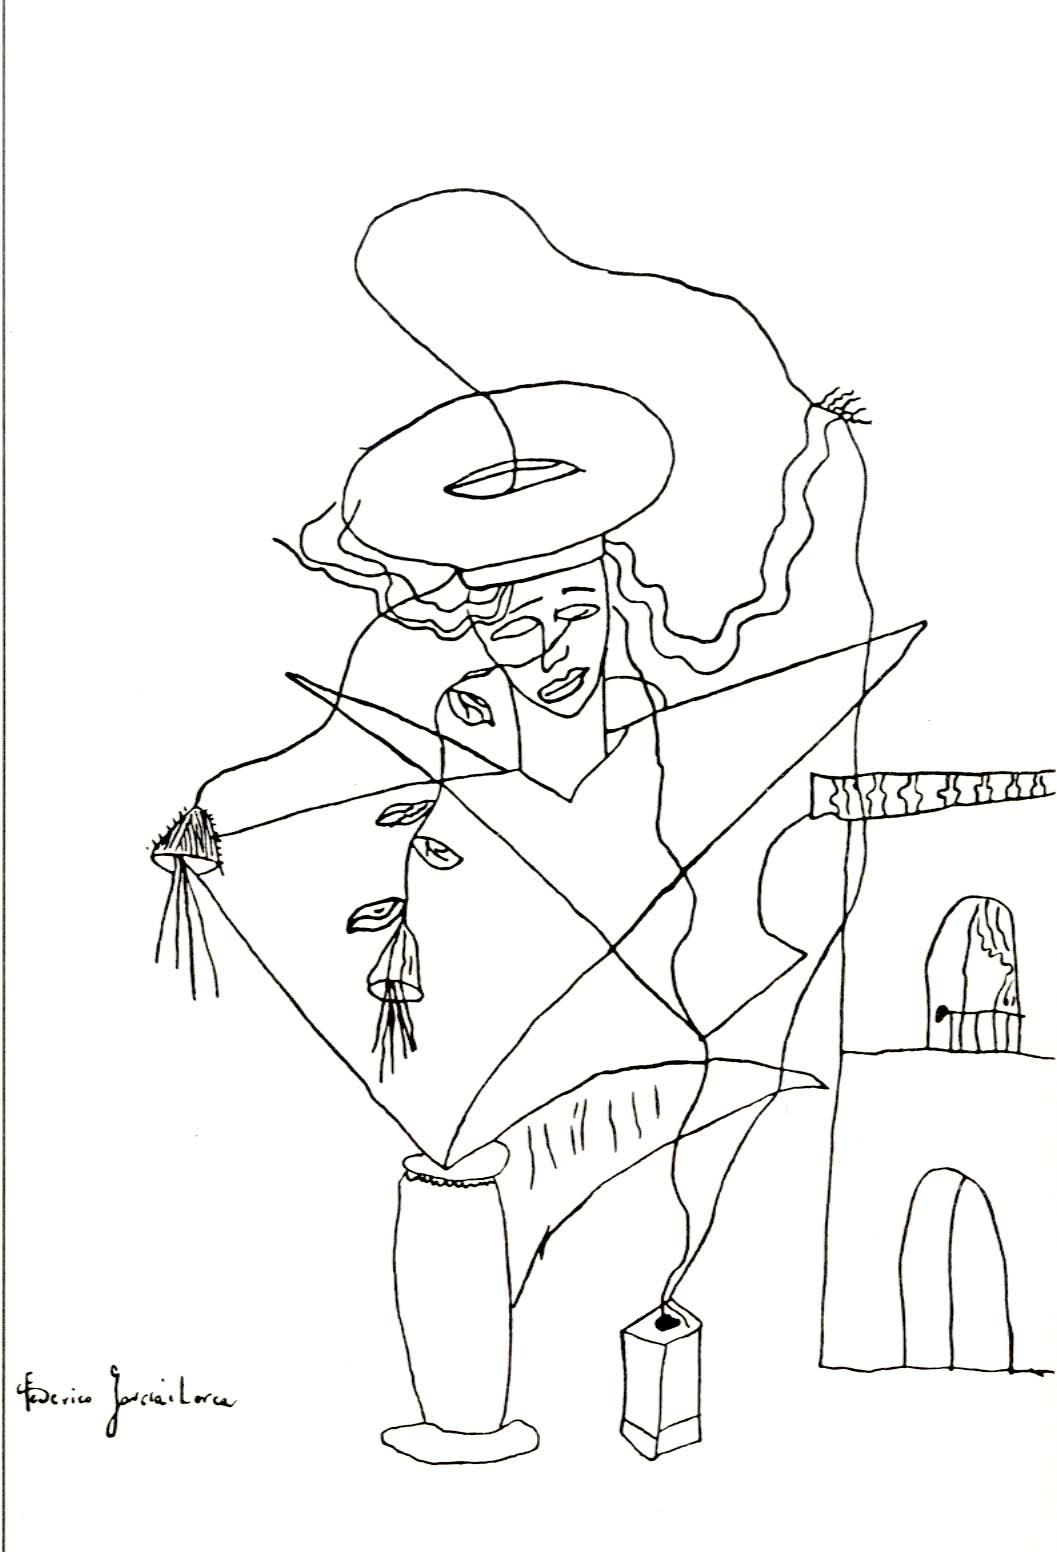 barbarous nights lorca s drawings 2001 Pontiac Grand AM Stereo Wiring Diagram